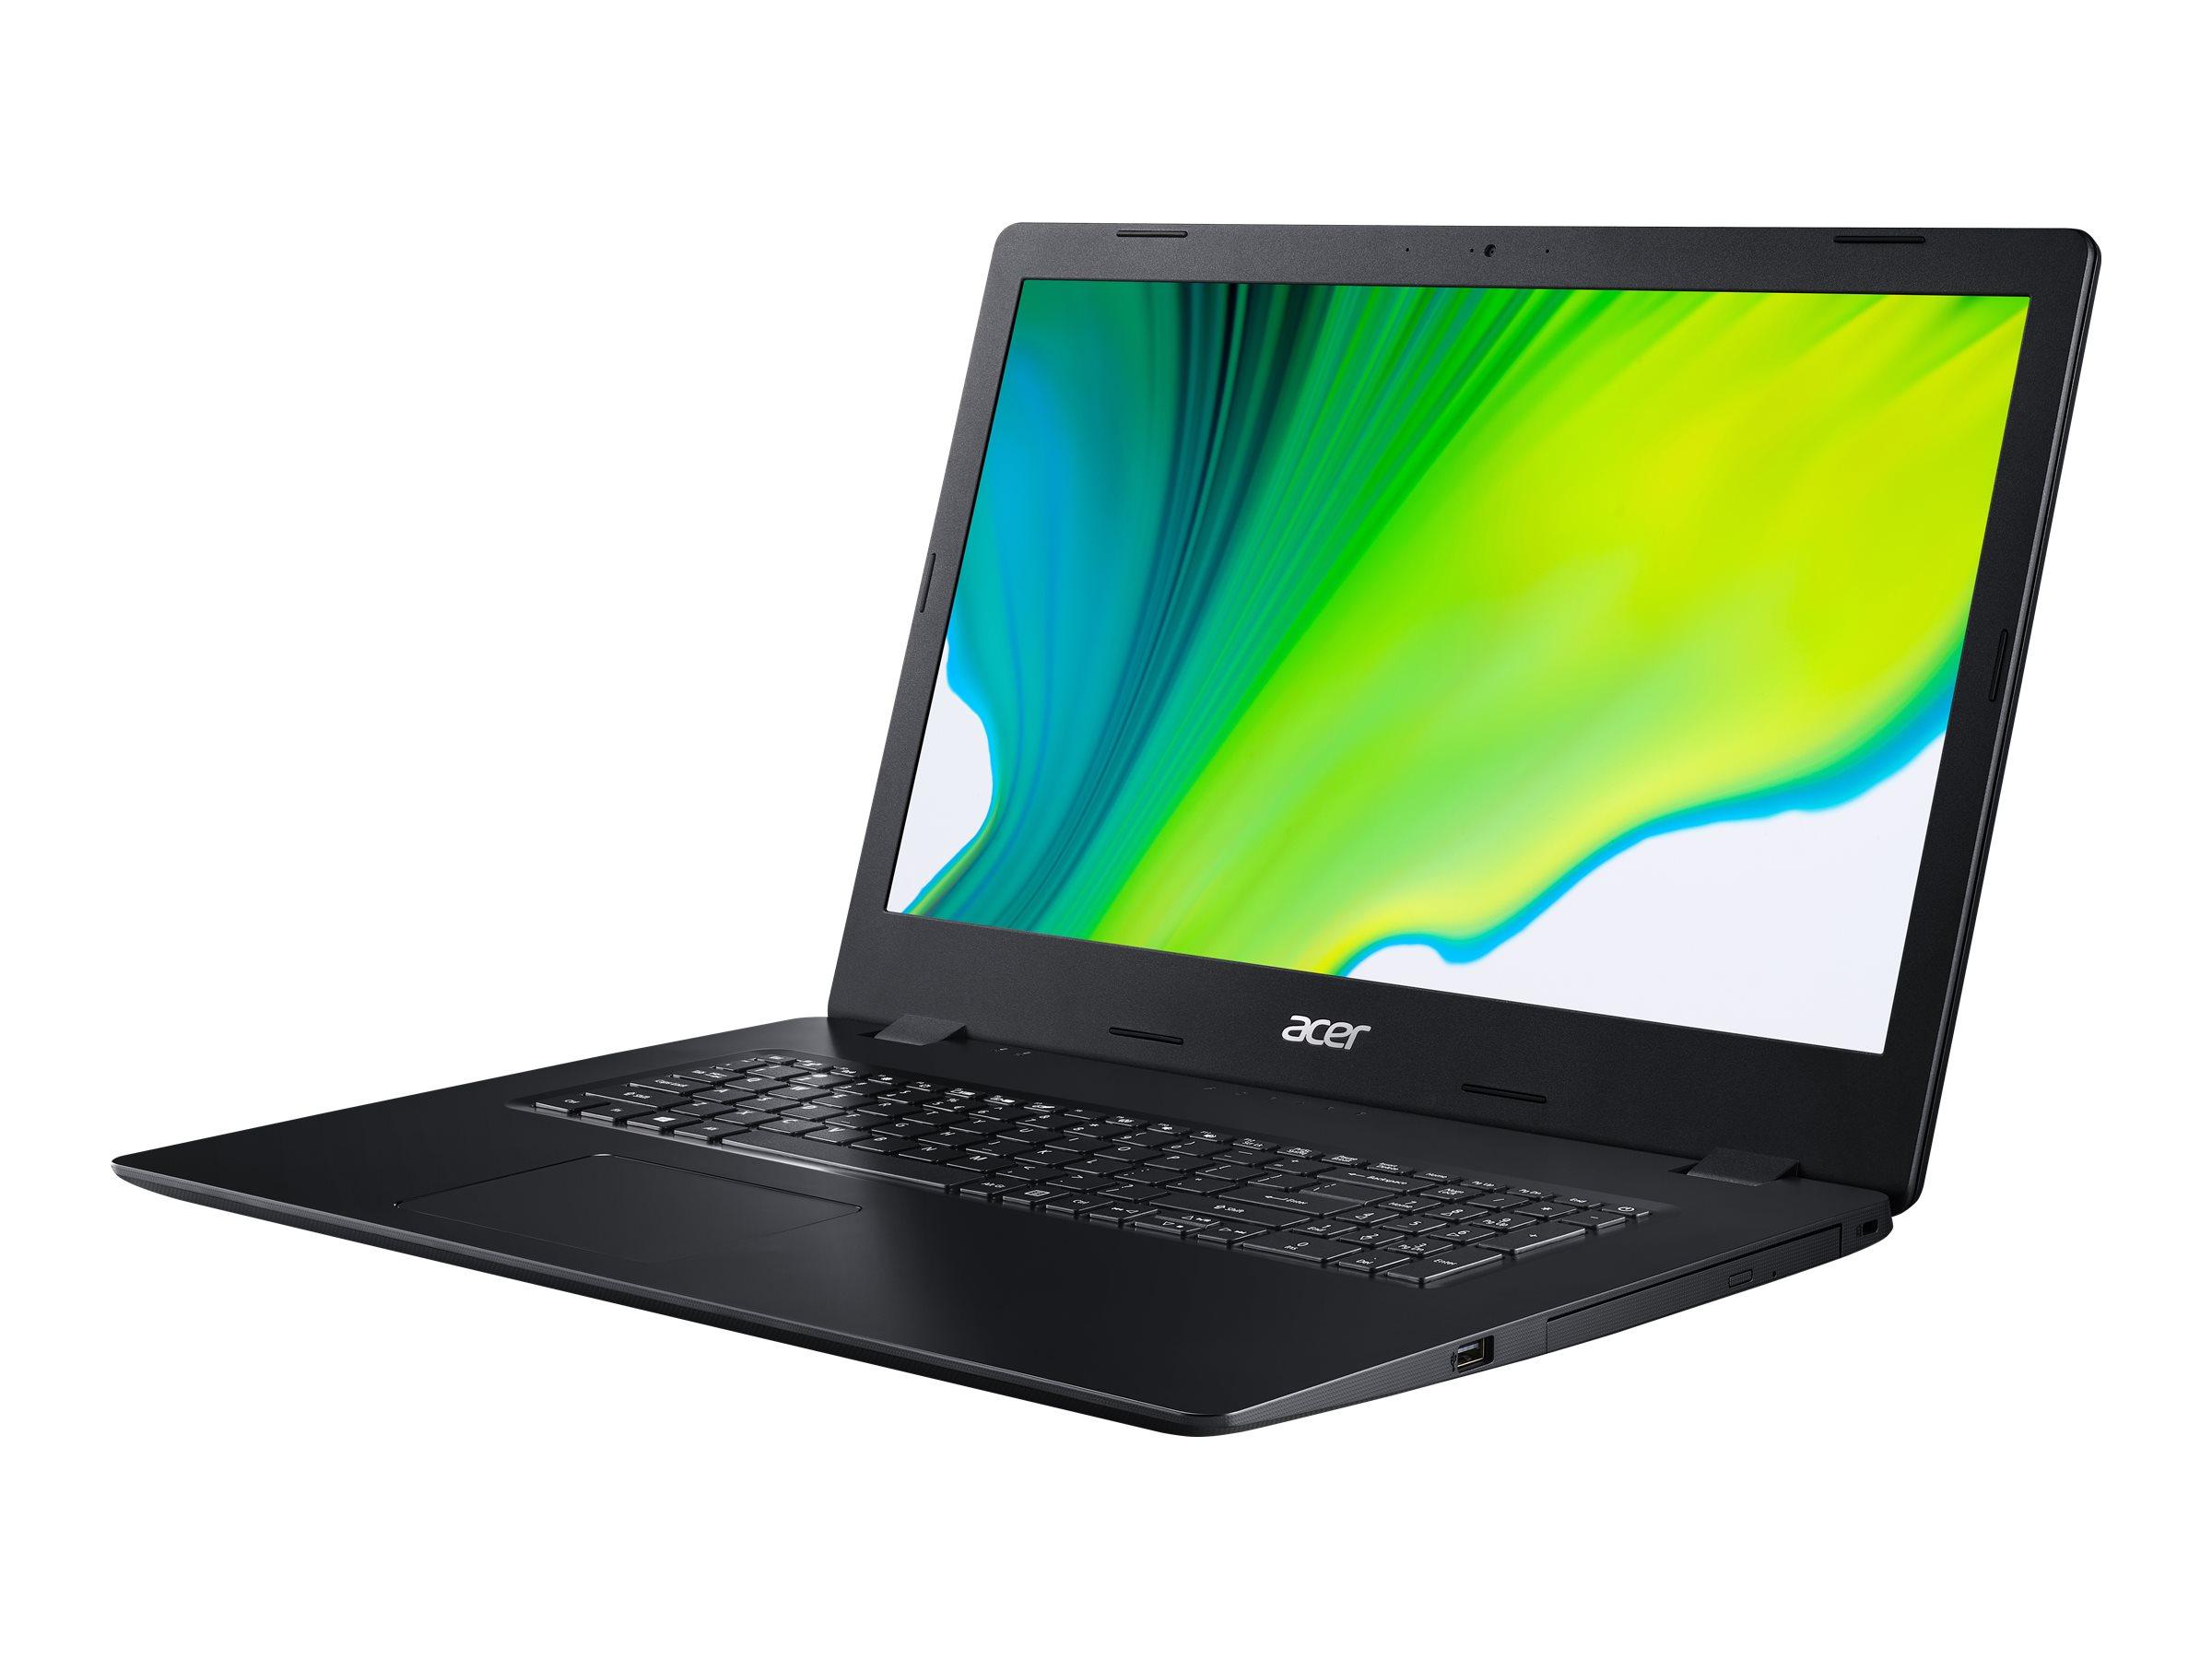 Acer Aspire 3 A317-52-36F4 - Core i3 1005G1 / 1.2 GHz - Win 10 Home 64-Bit - 8 GB RAM - 256 GB SSD - DVD-Writer - 43.9 c